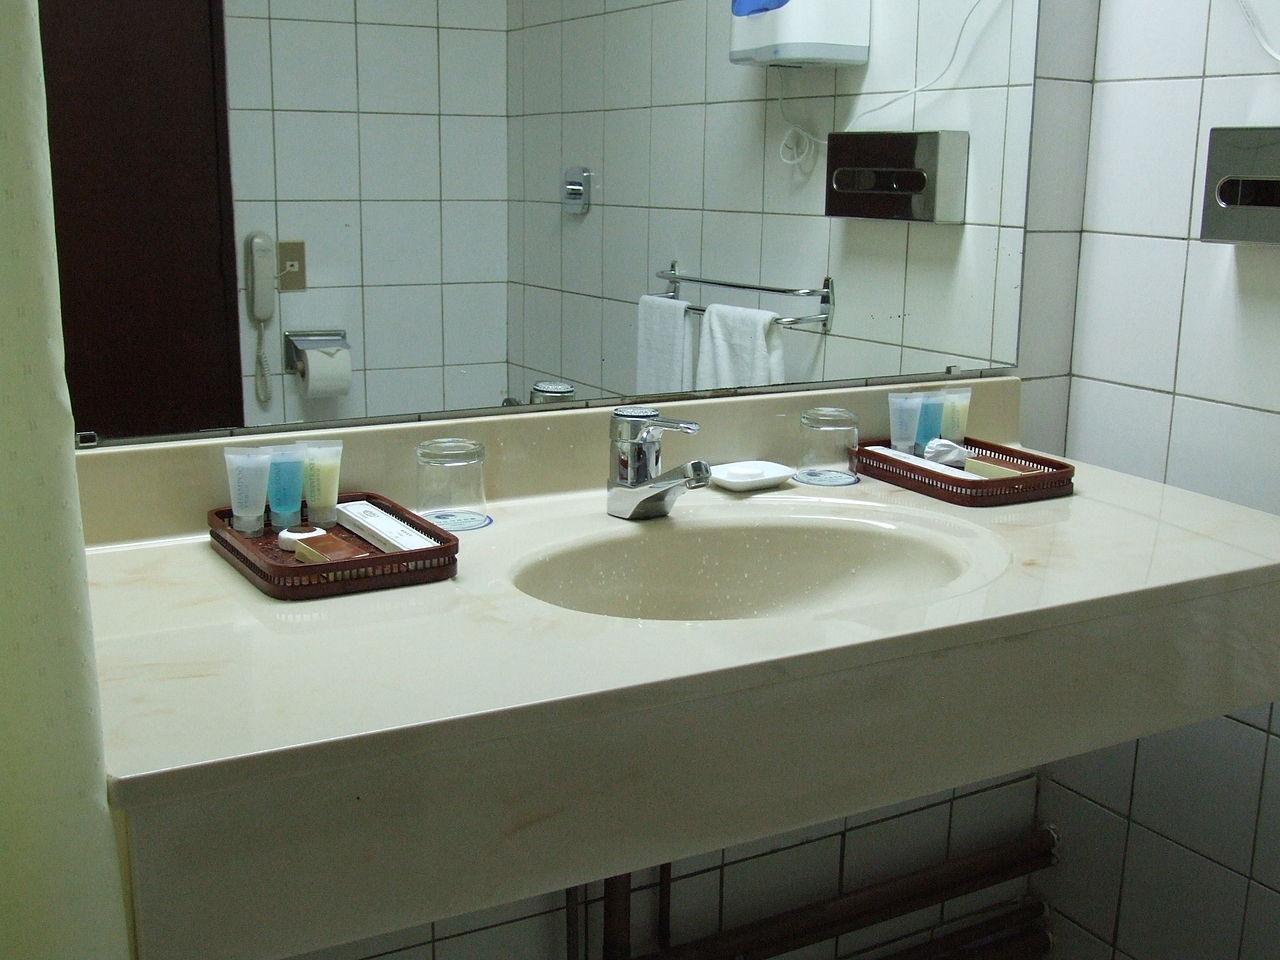 File:Yanggakdo International Hotel bathroom.JPG - Wikimedia Commons